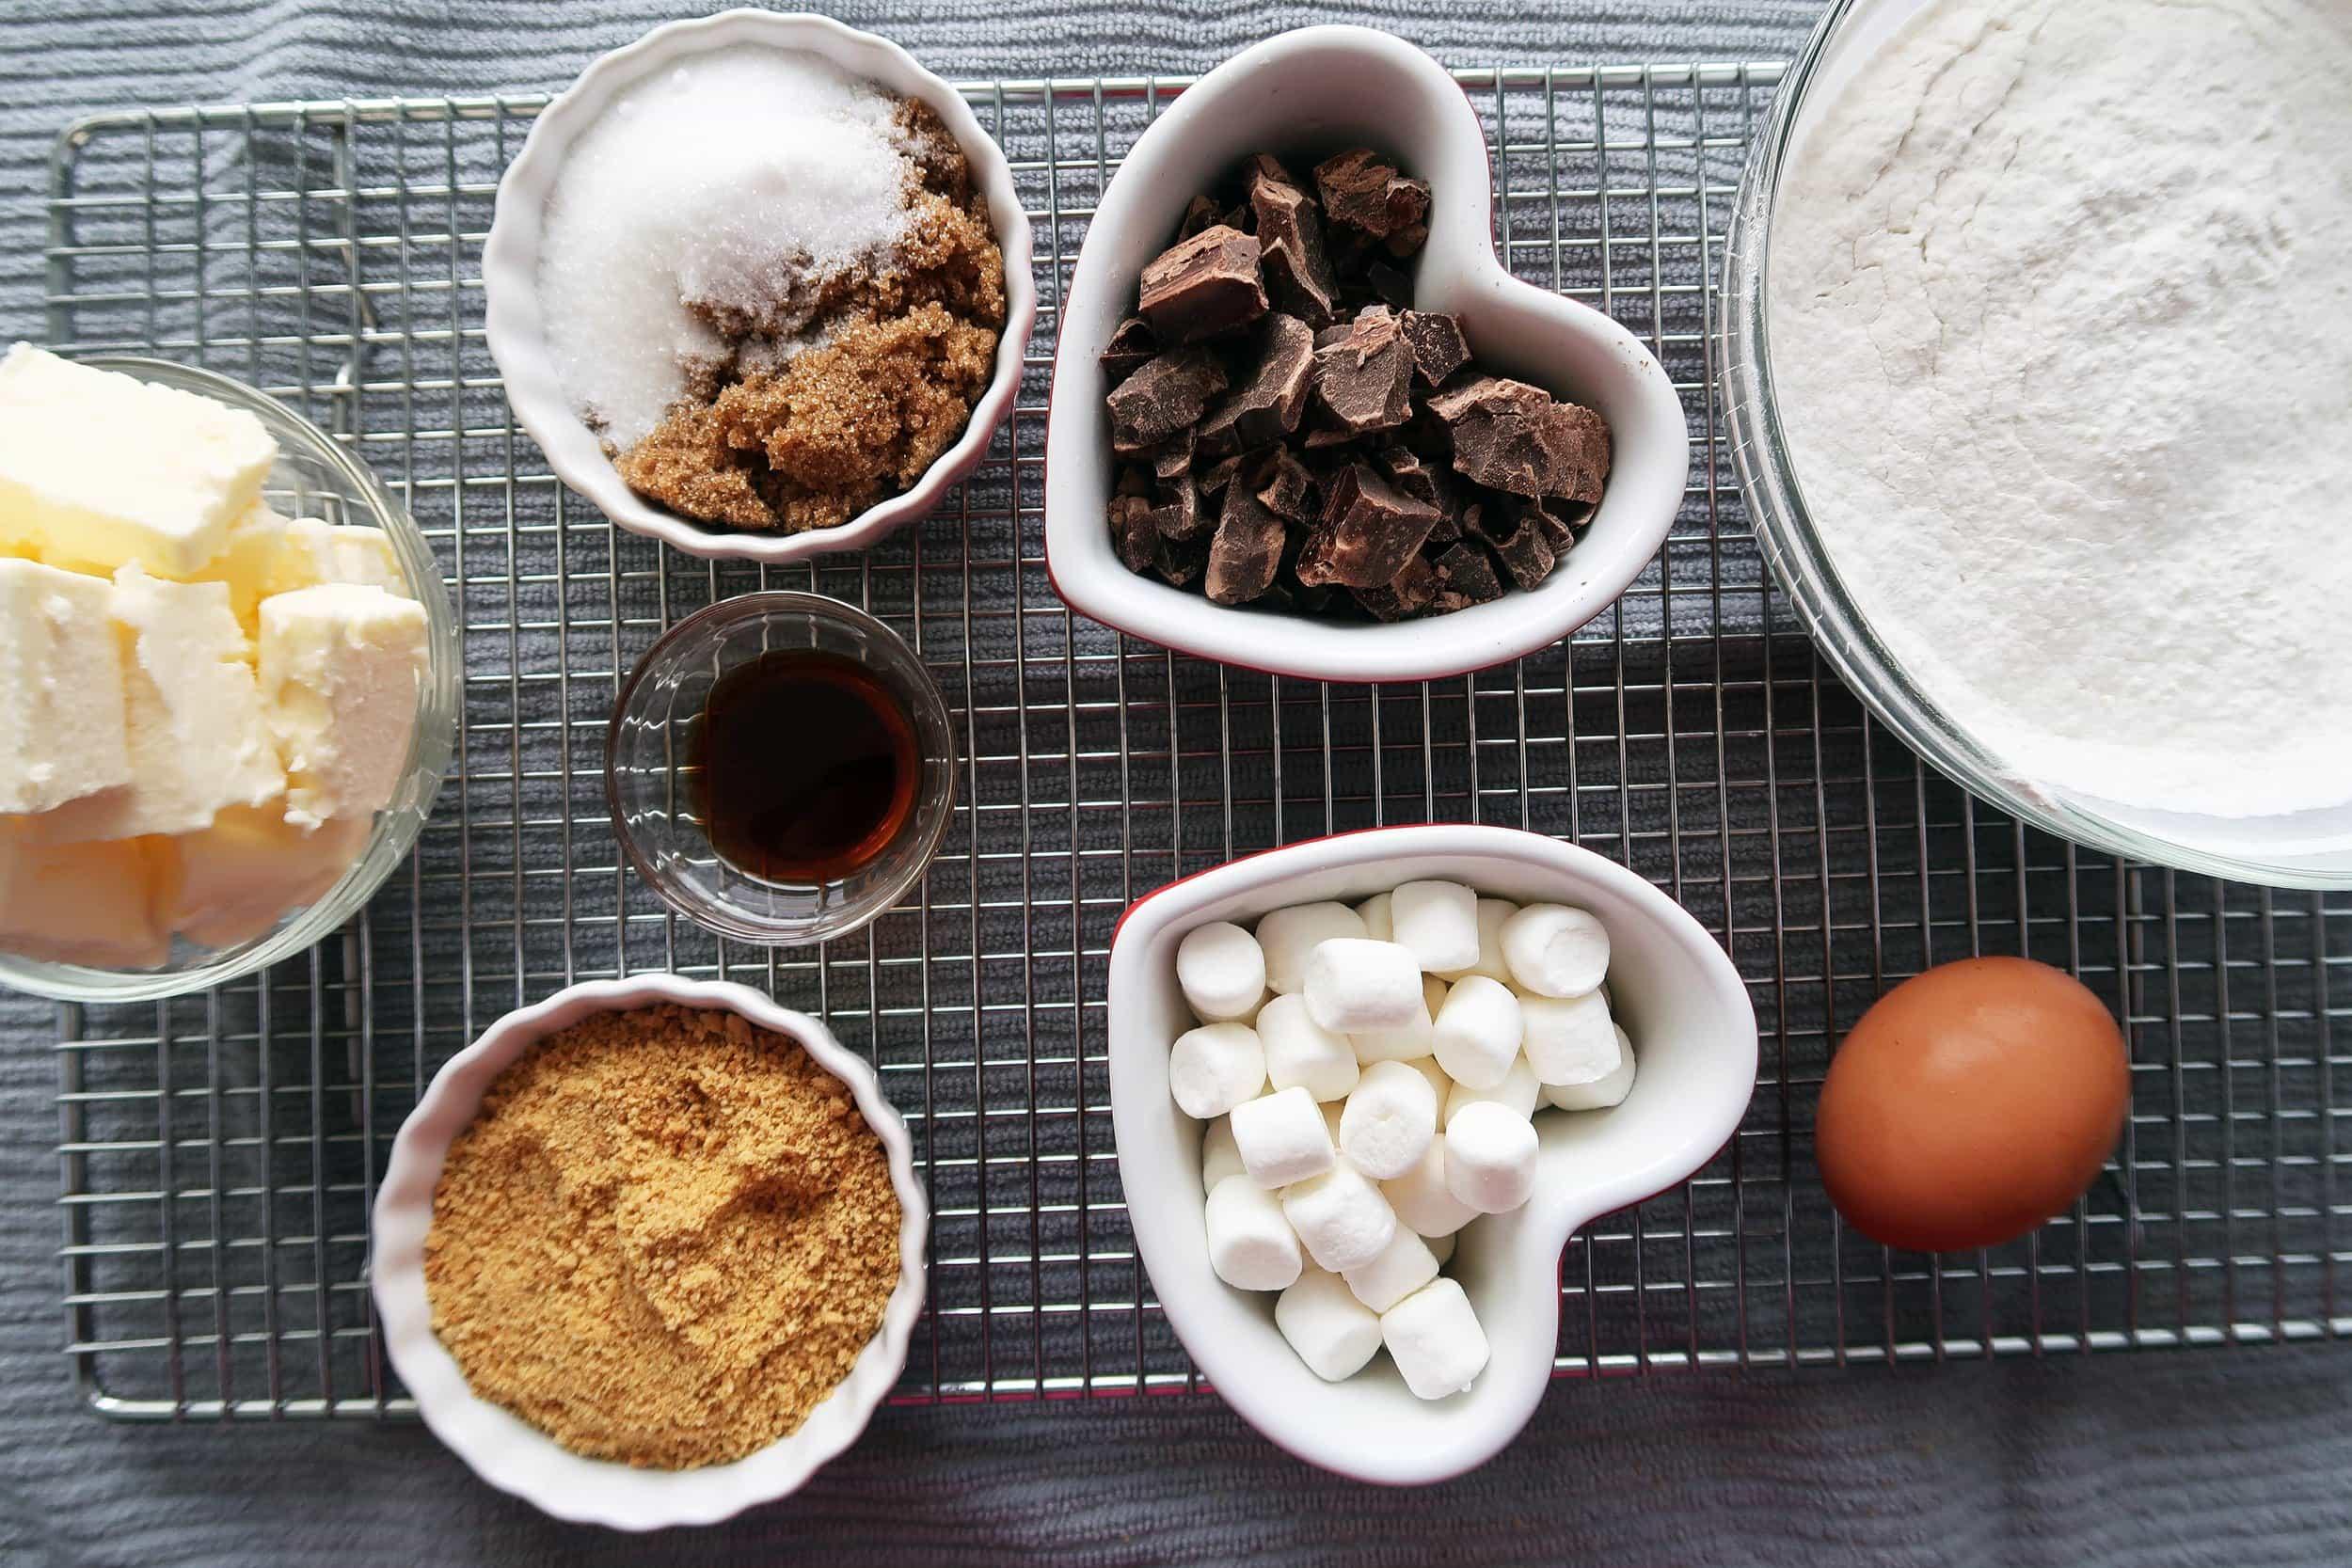 Graham cracker crumbs, marshmallows, chocolate, eggs, butter, flour, sugar, and vanilla.